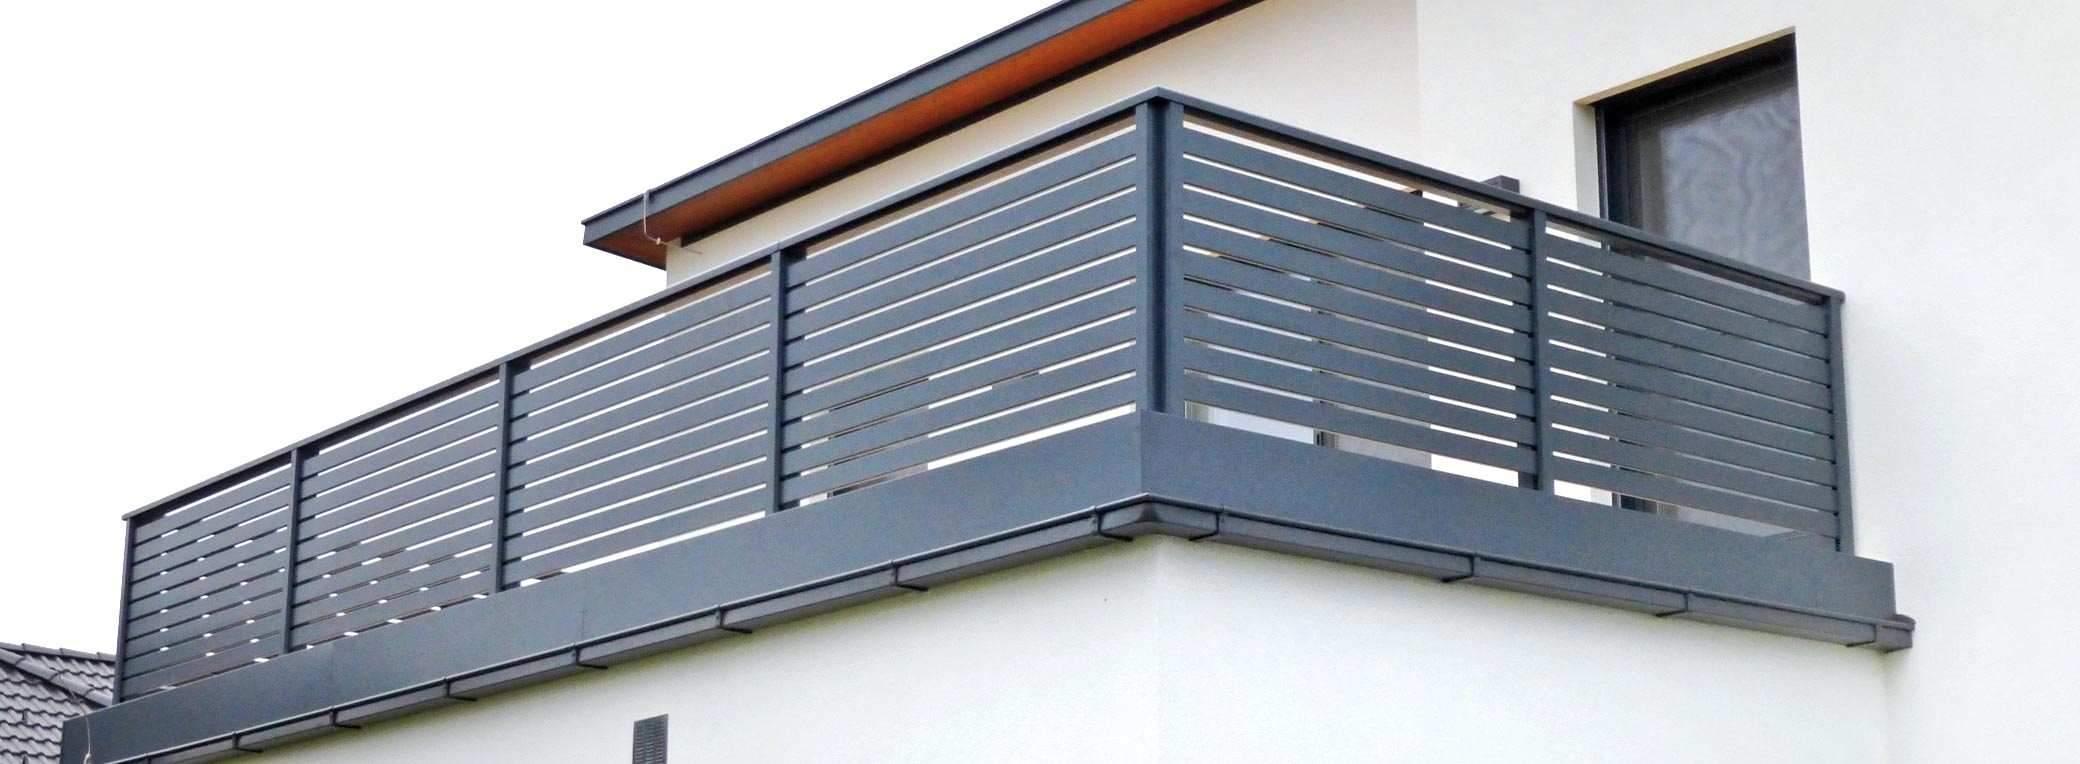 gardinen fur balkontur einzigartig sichtschutz fur balkon 76 and gel c3 a4nder f c3 bcr balkon of gardinen fur balkontur